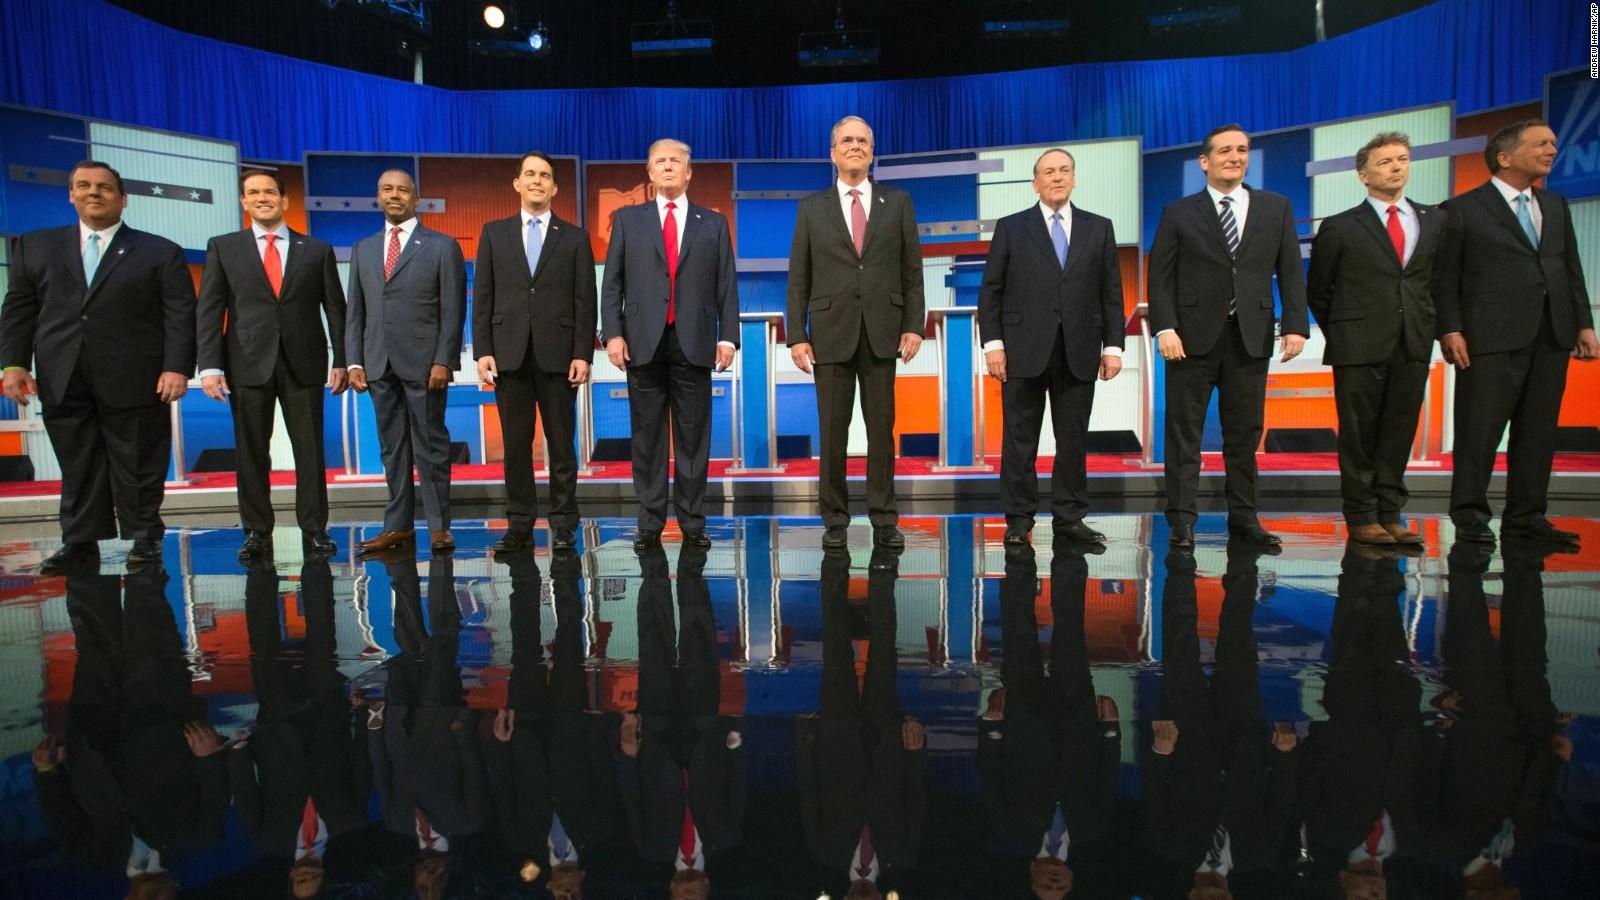 republican presidential debate 8 takeaways cnnpolitics